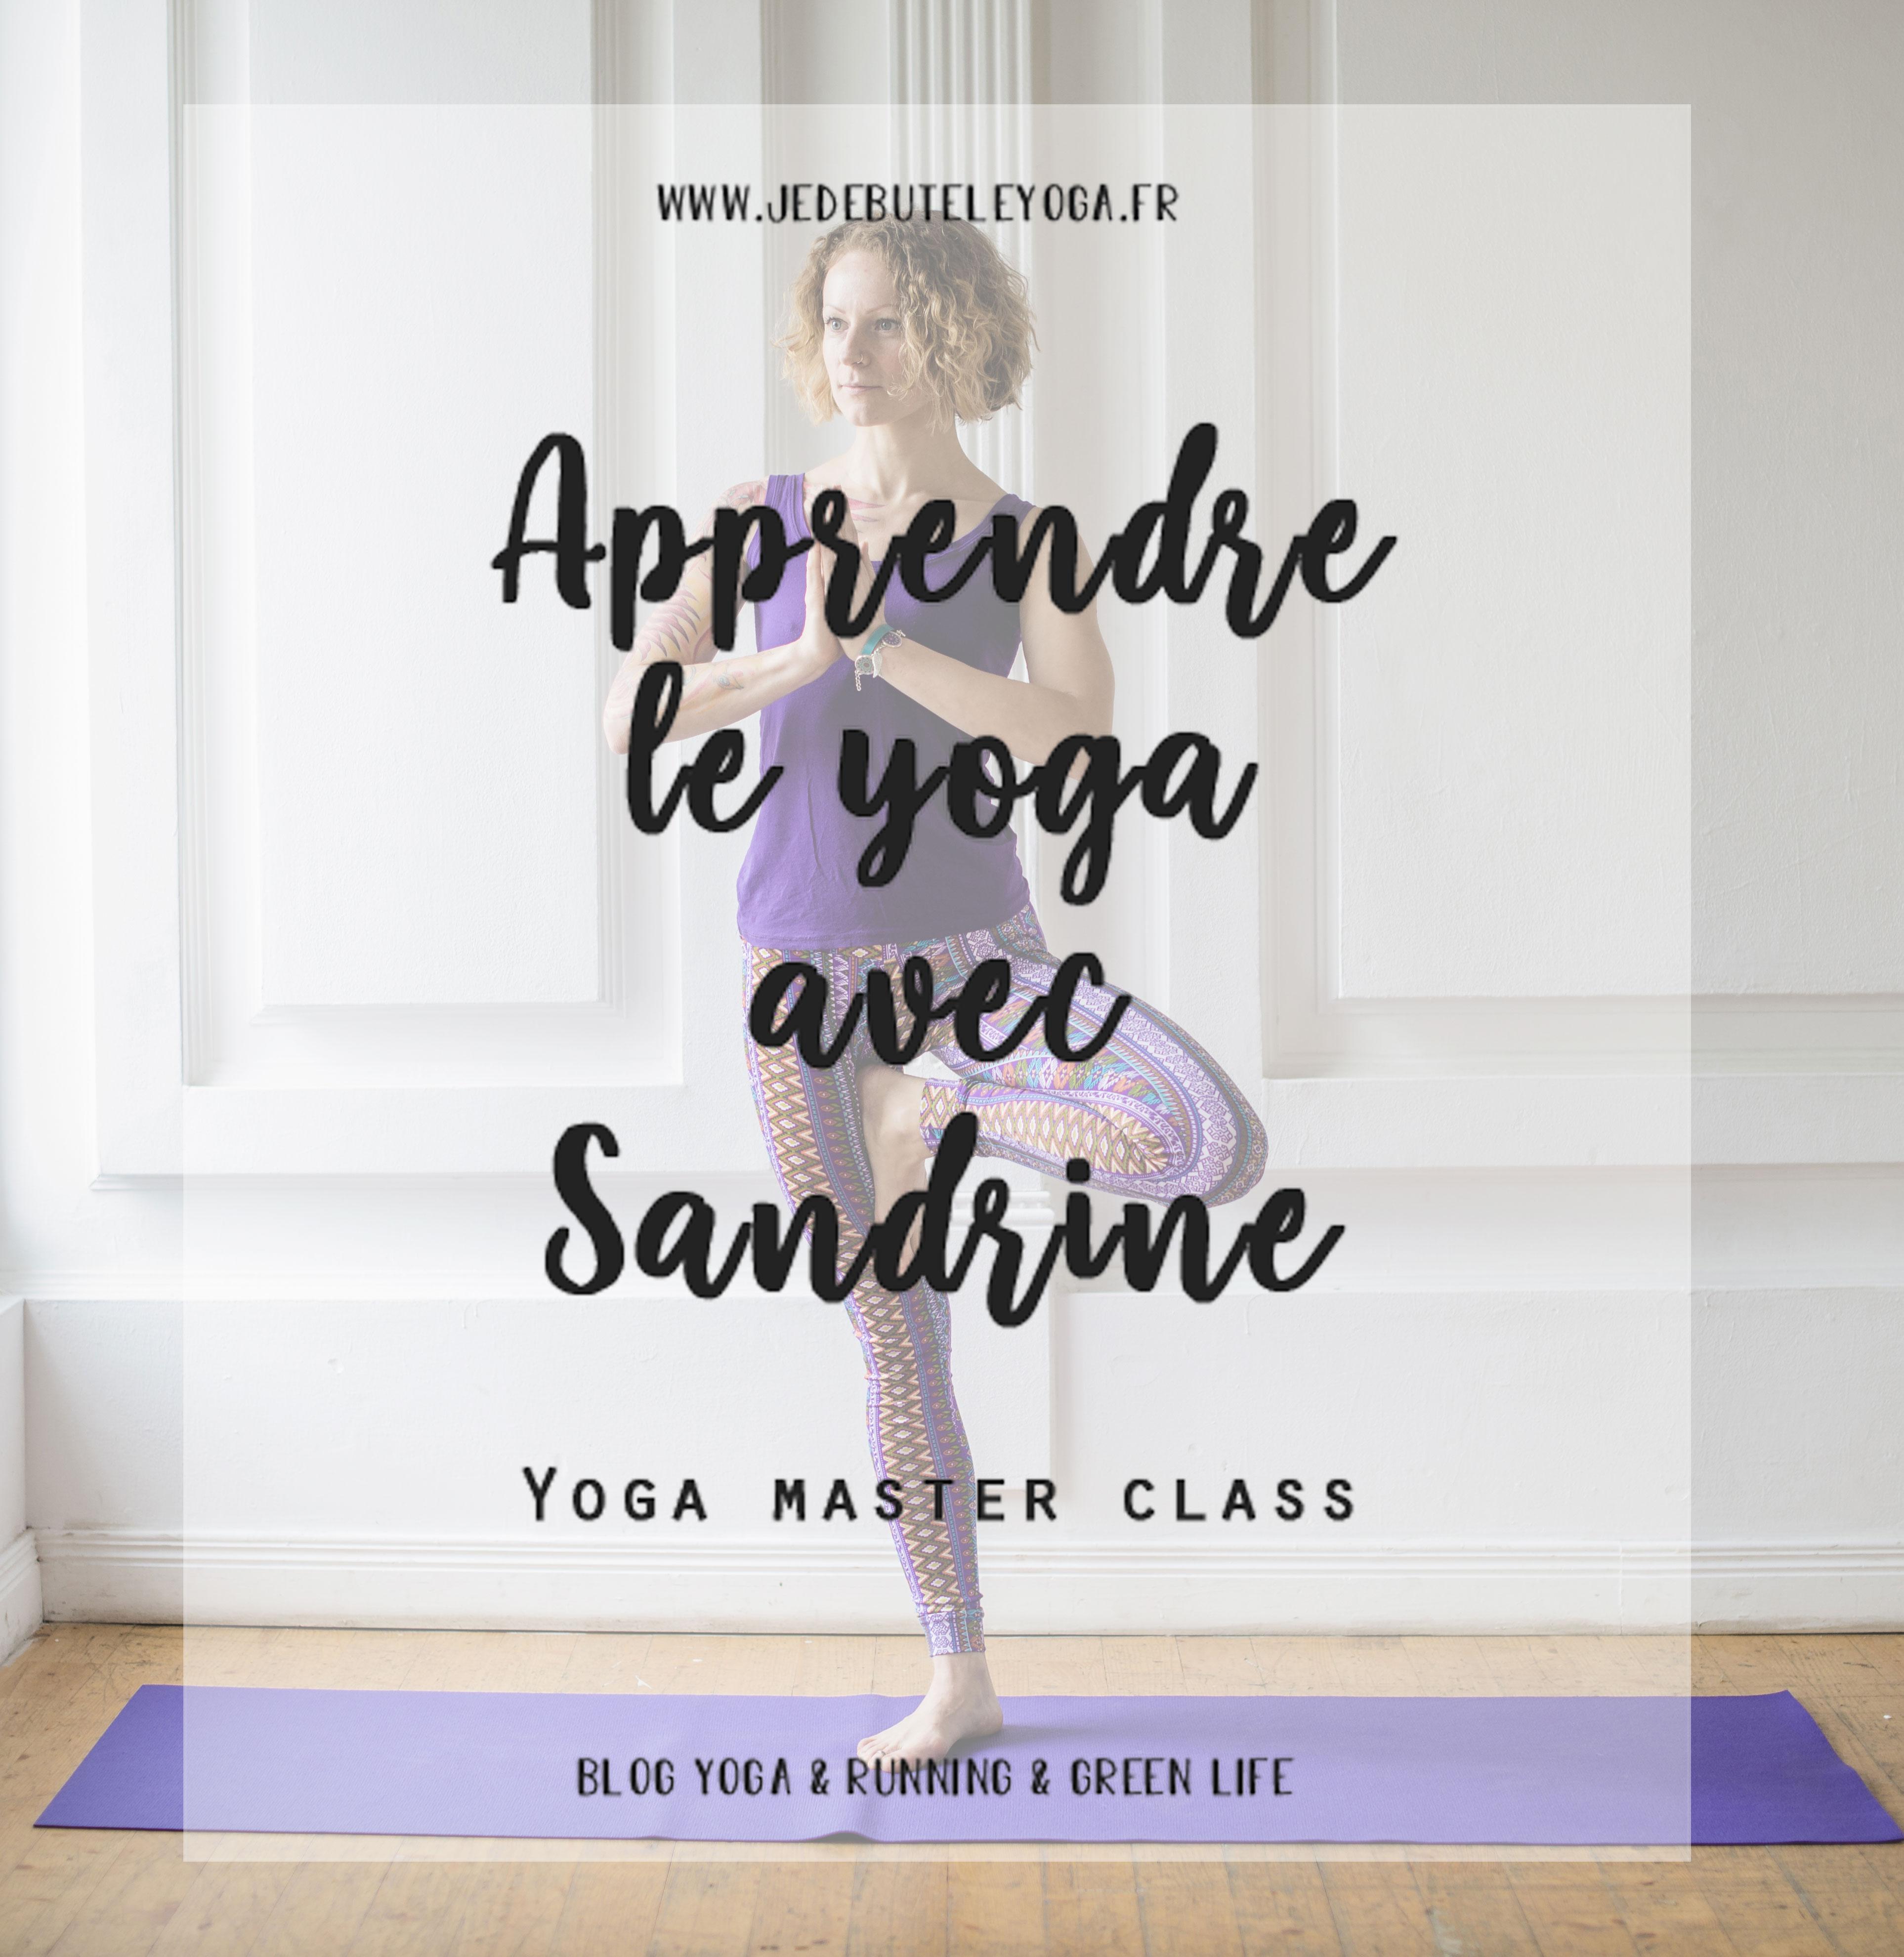 apprendre le yoga avec sandrine, yoga master class by doctissimo